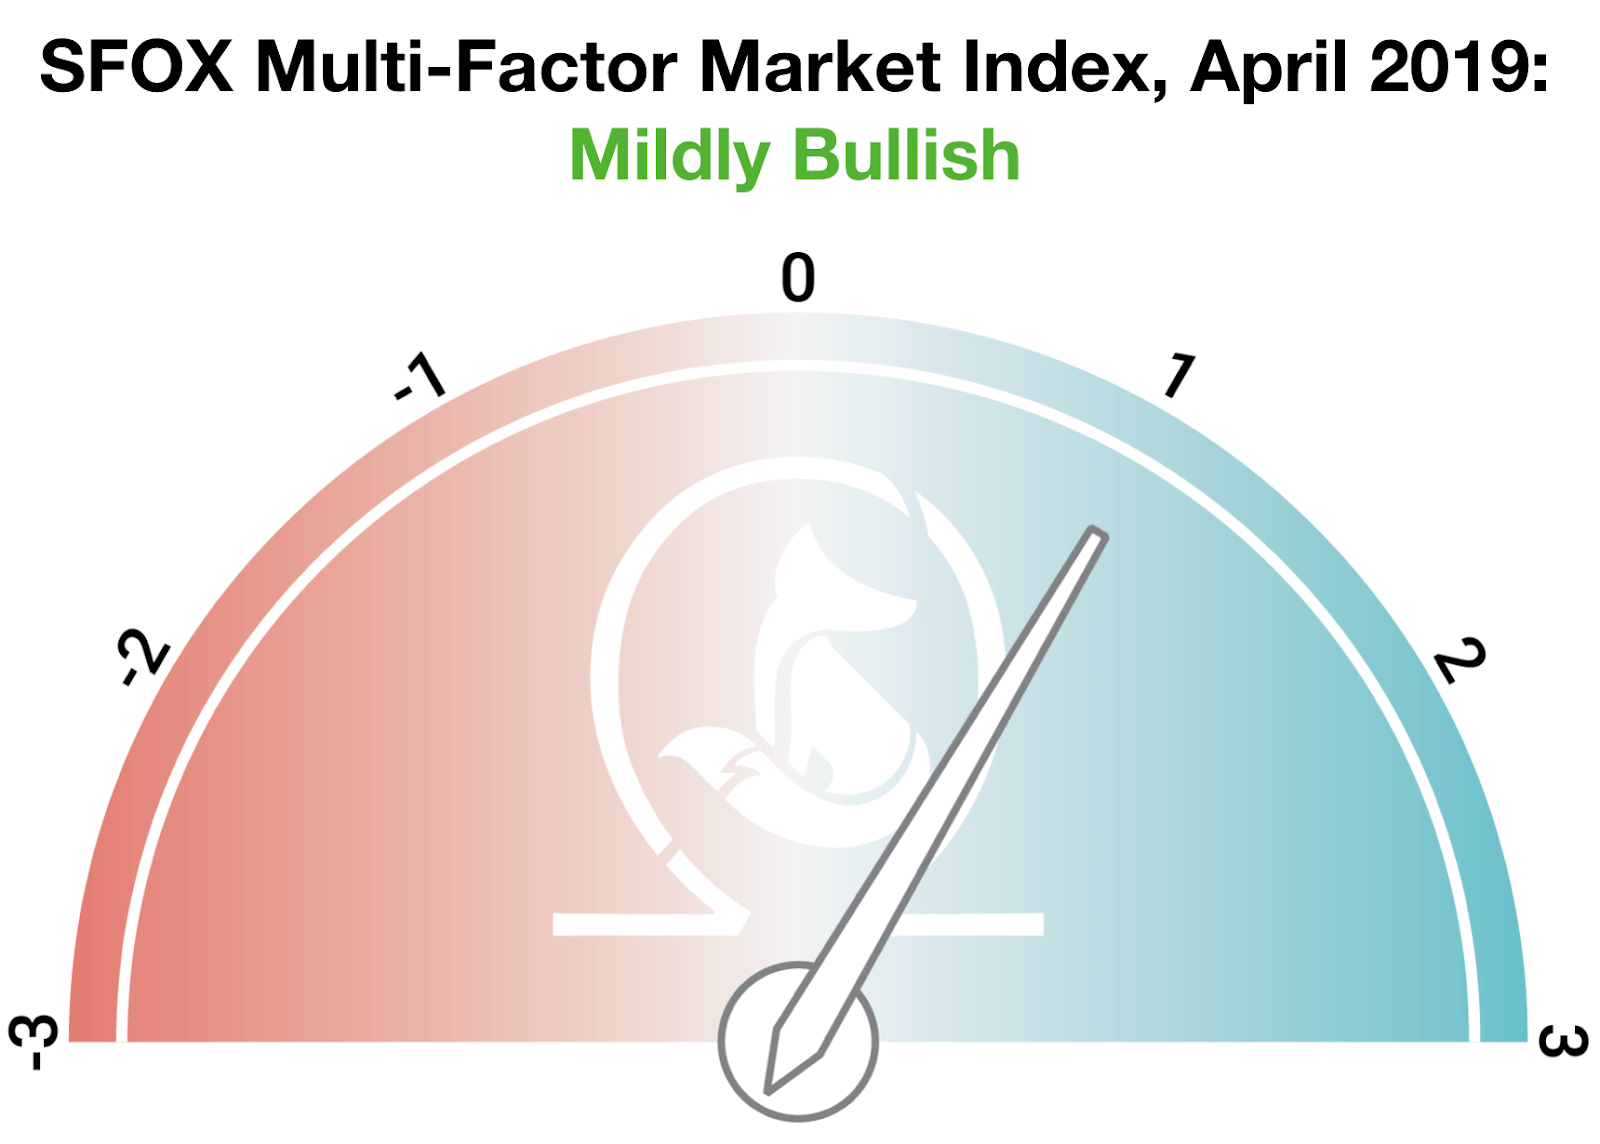 SFOX Multi-Factor Market Index za kwieceń 2019 r. | źródło: blog.sfox.com